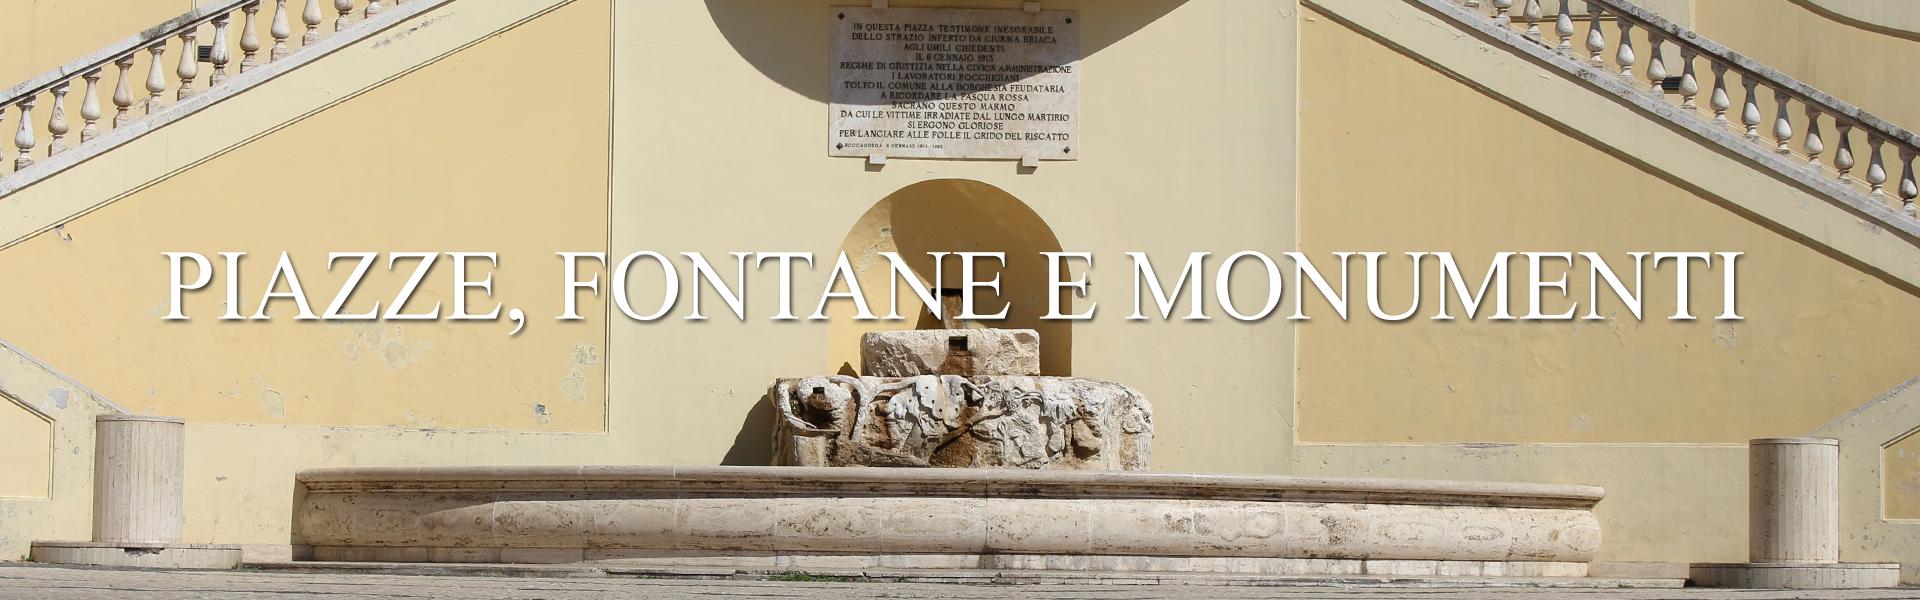 piazze-fontane-monumenti